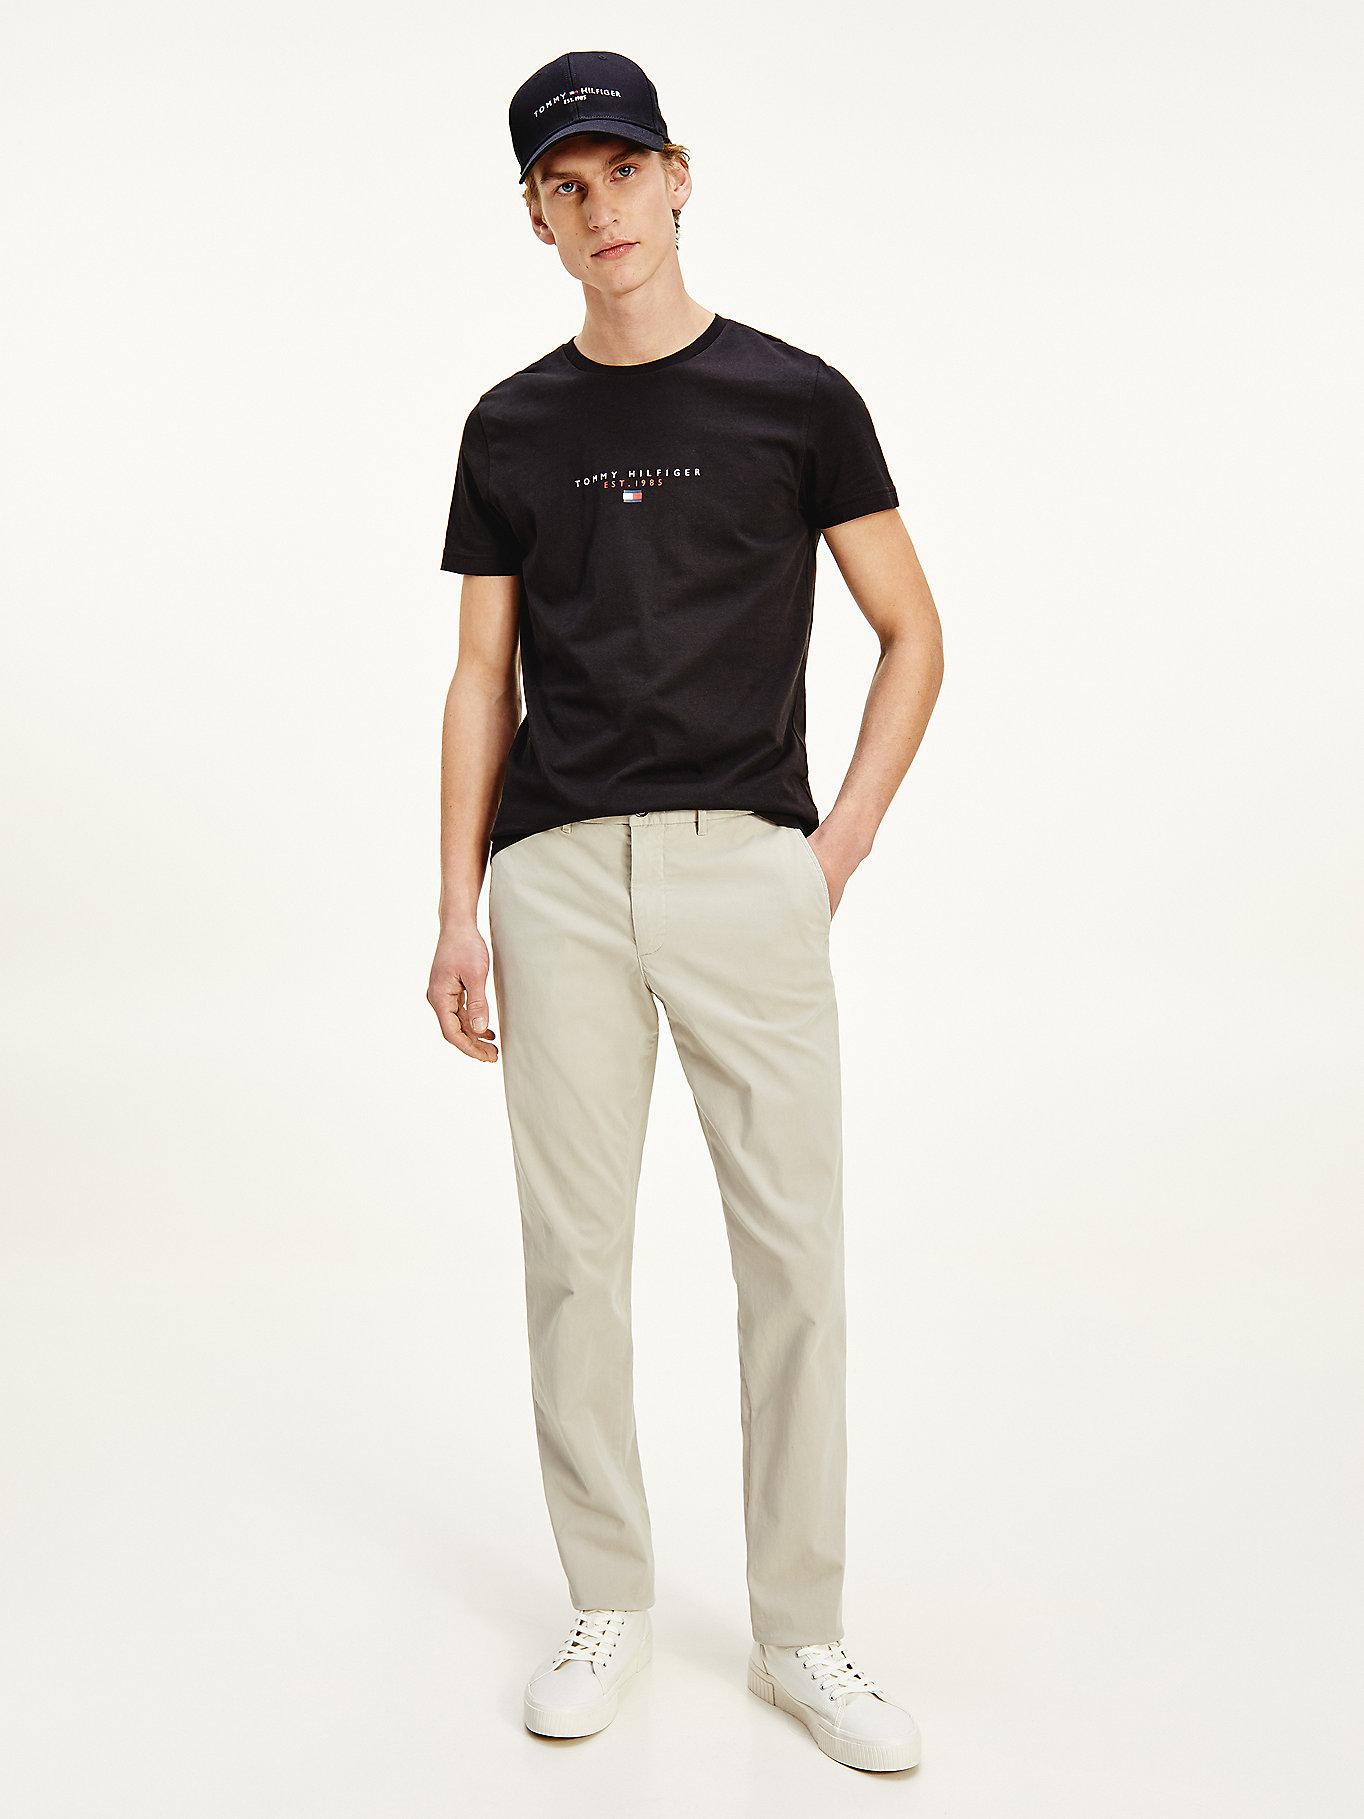 Мужская одежда Tommy Hilfiger